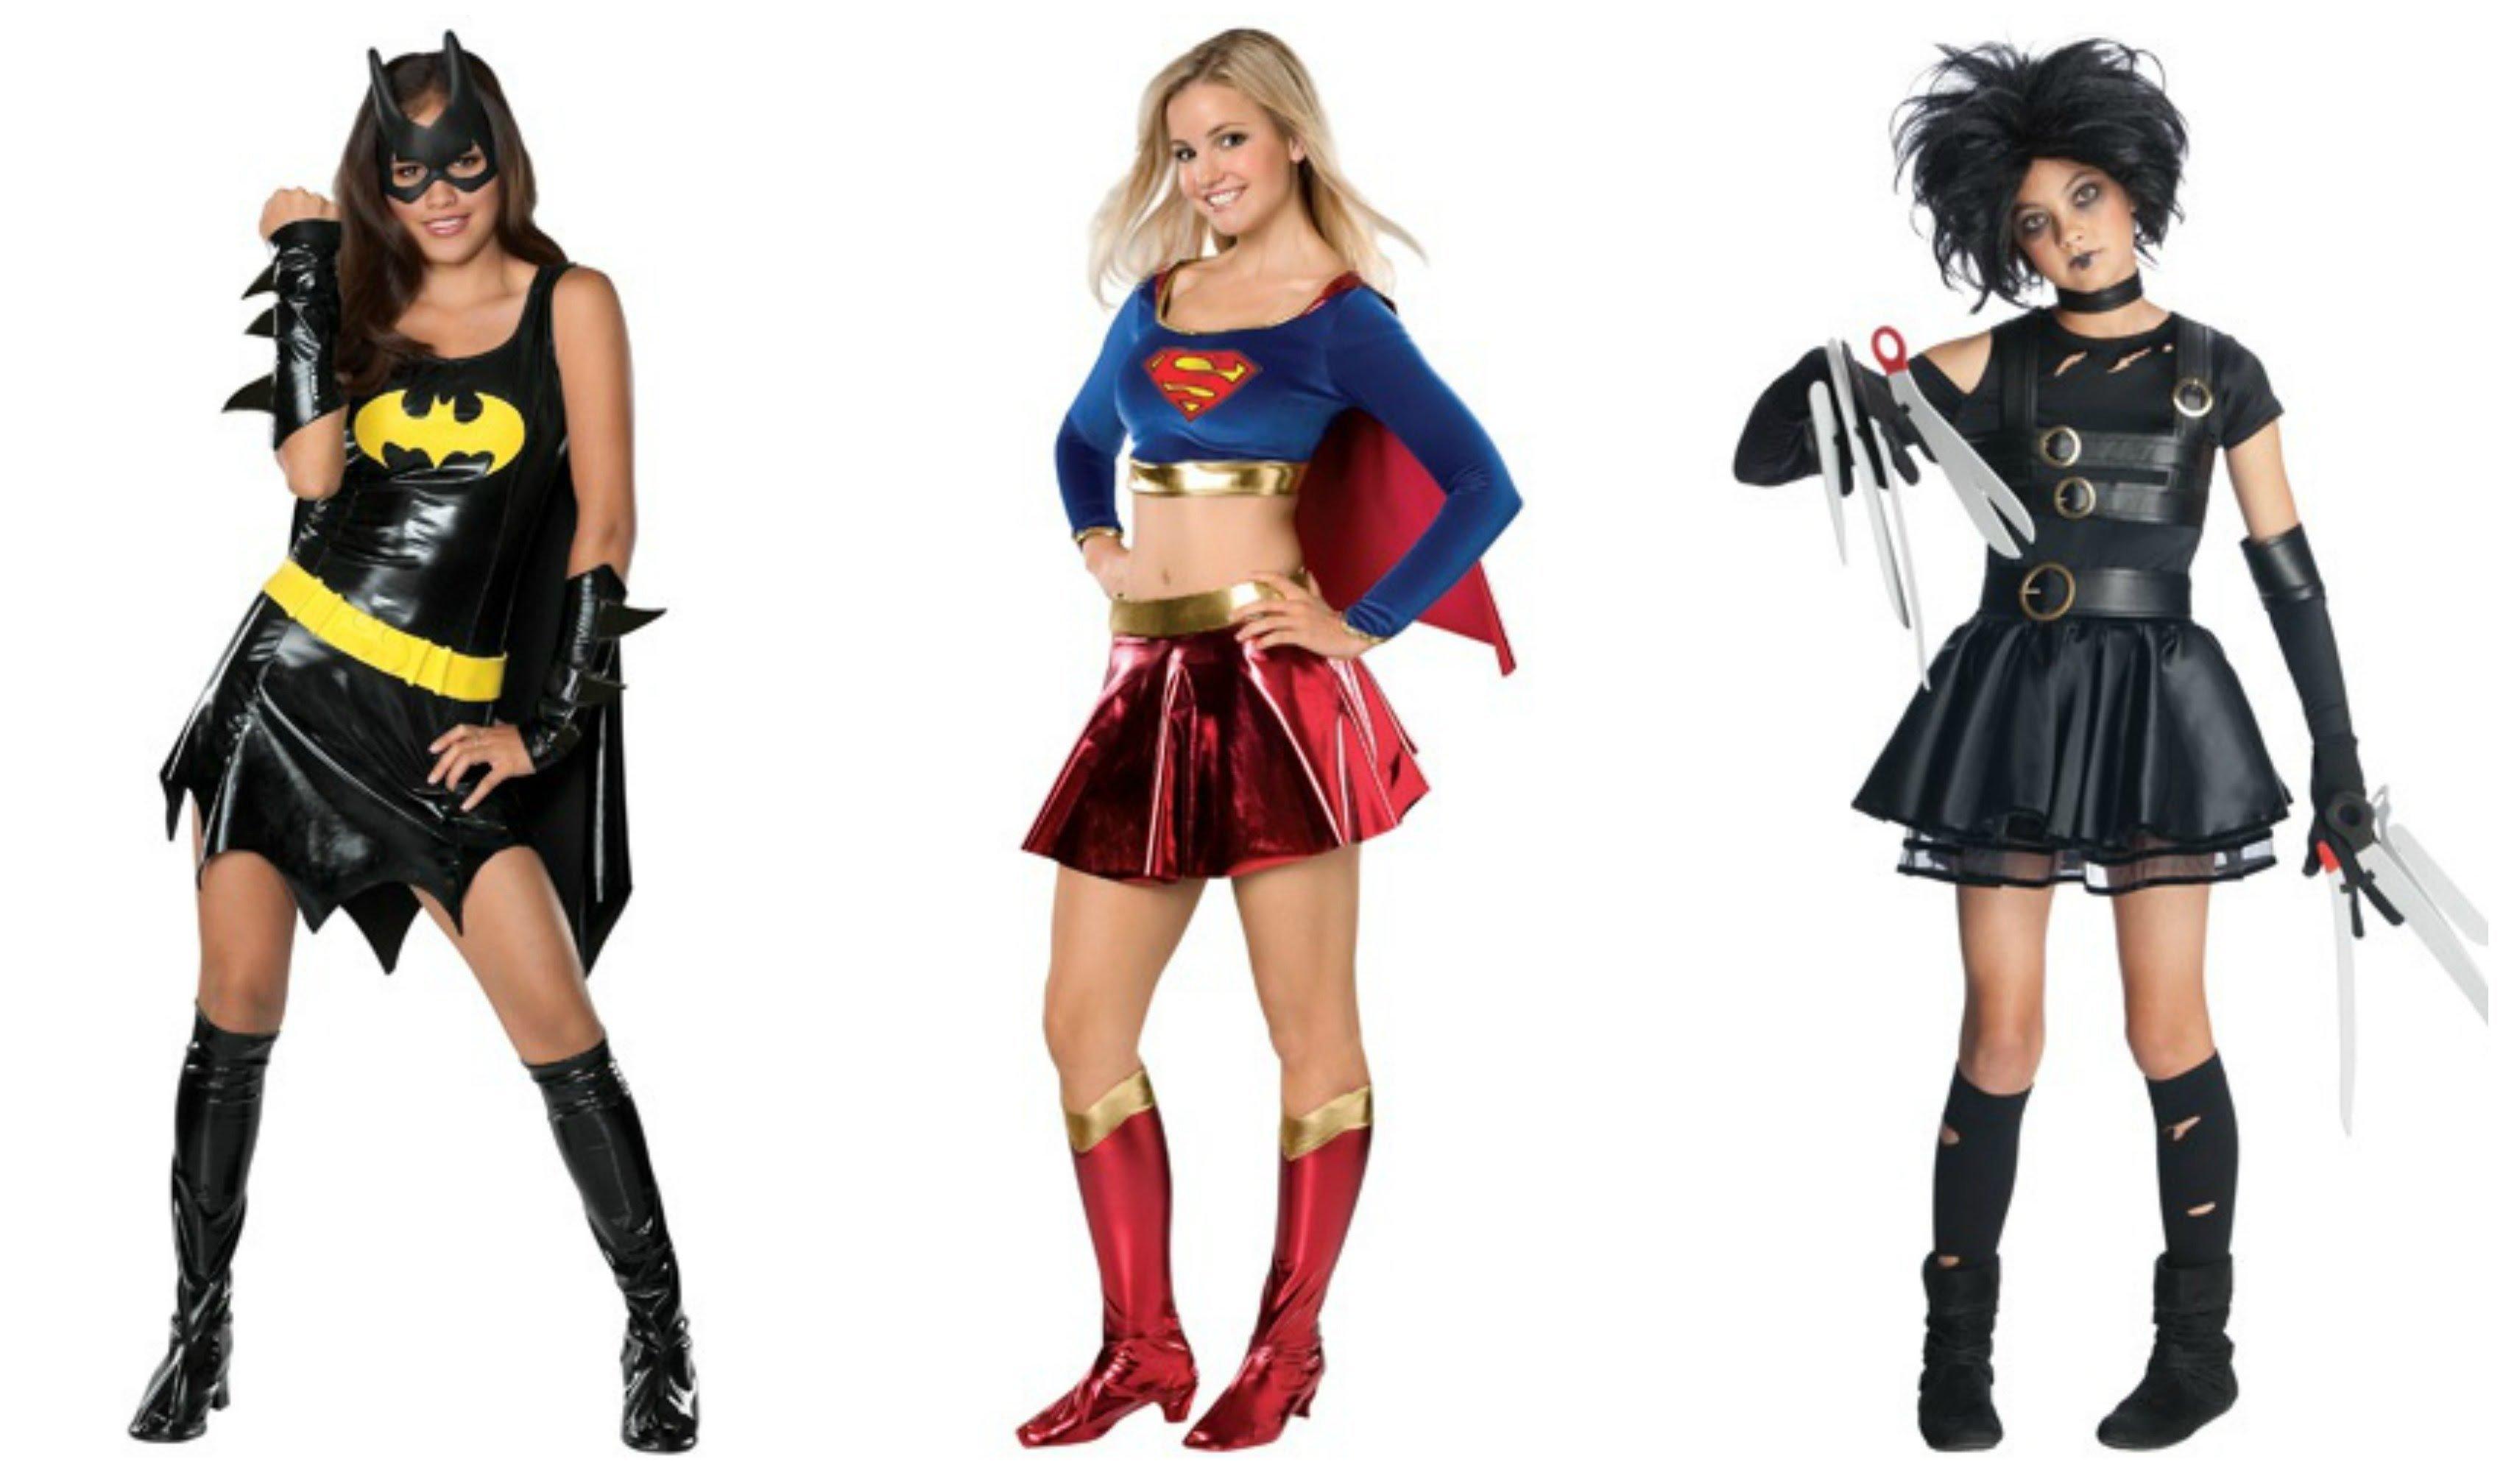 10 Wonderful Cool Halloween Costume Ideas For Girls halloween costume ideas for teens girls youtube halloween costumes 23 2020